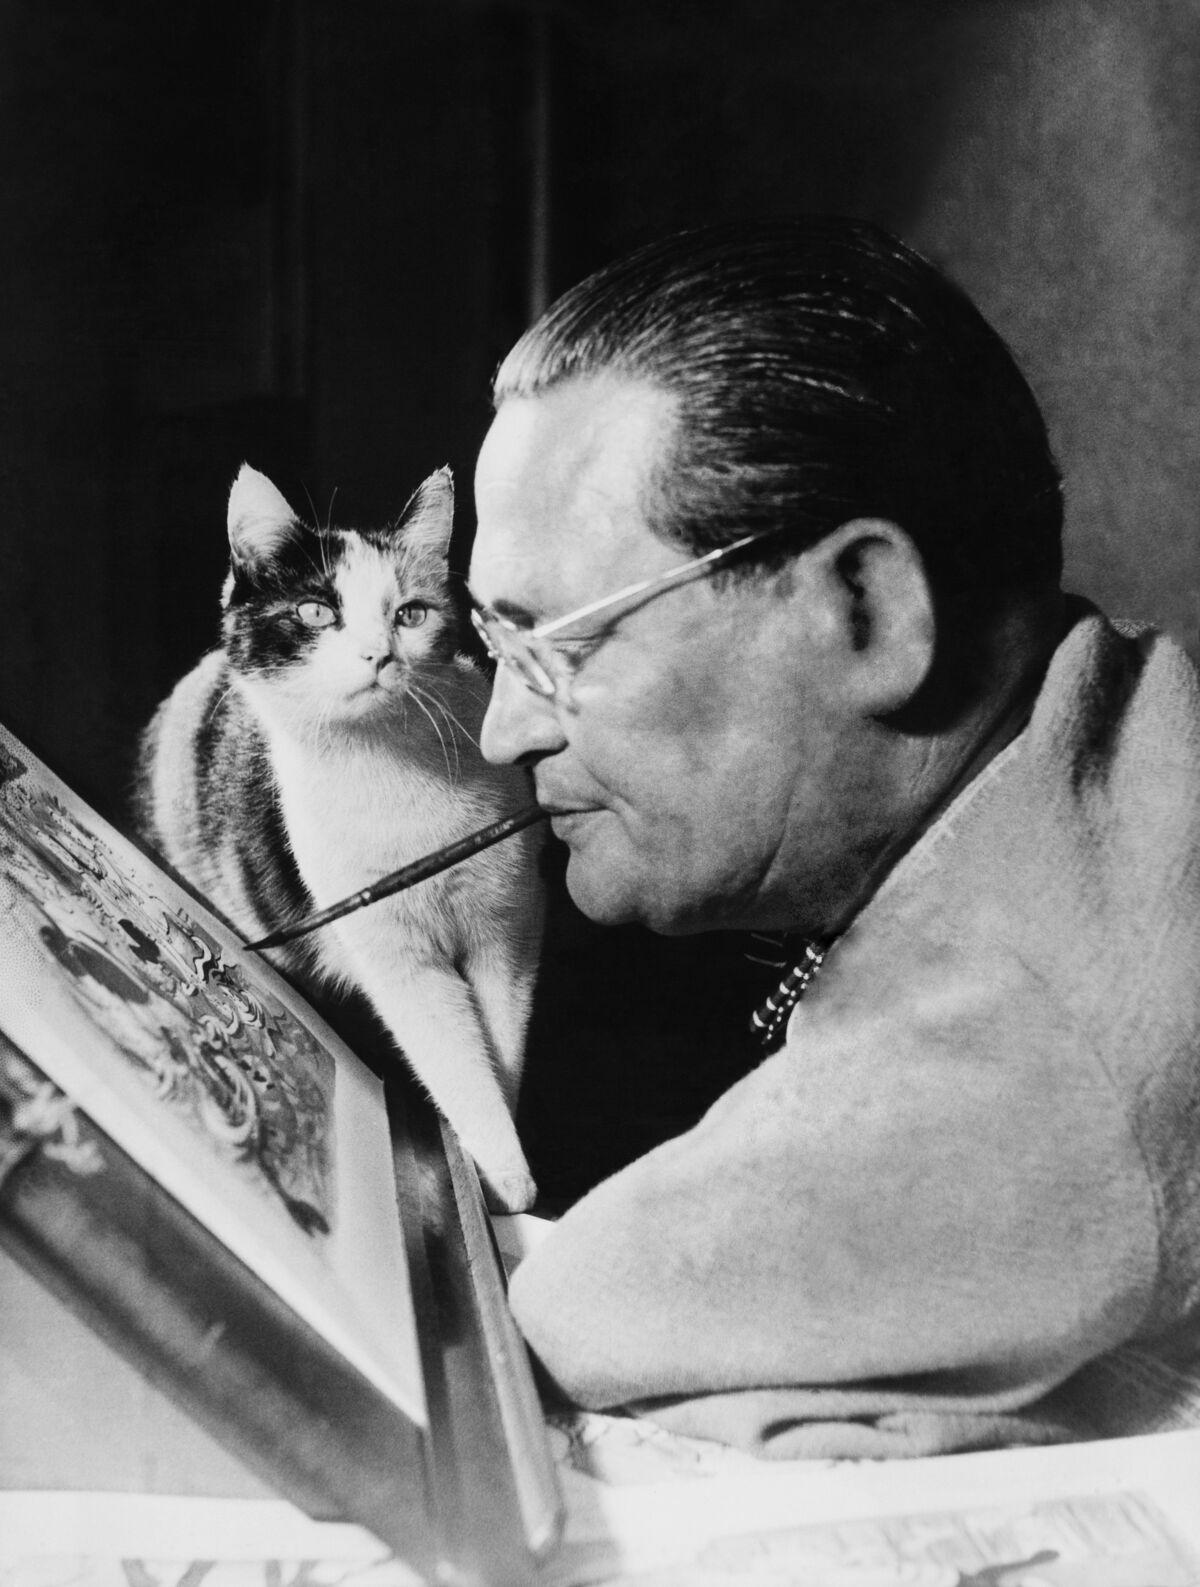 Portrait of Carl Fischer  with cat. Photo by Keystone-France/Gamma-Keystone via Getty Images.